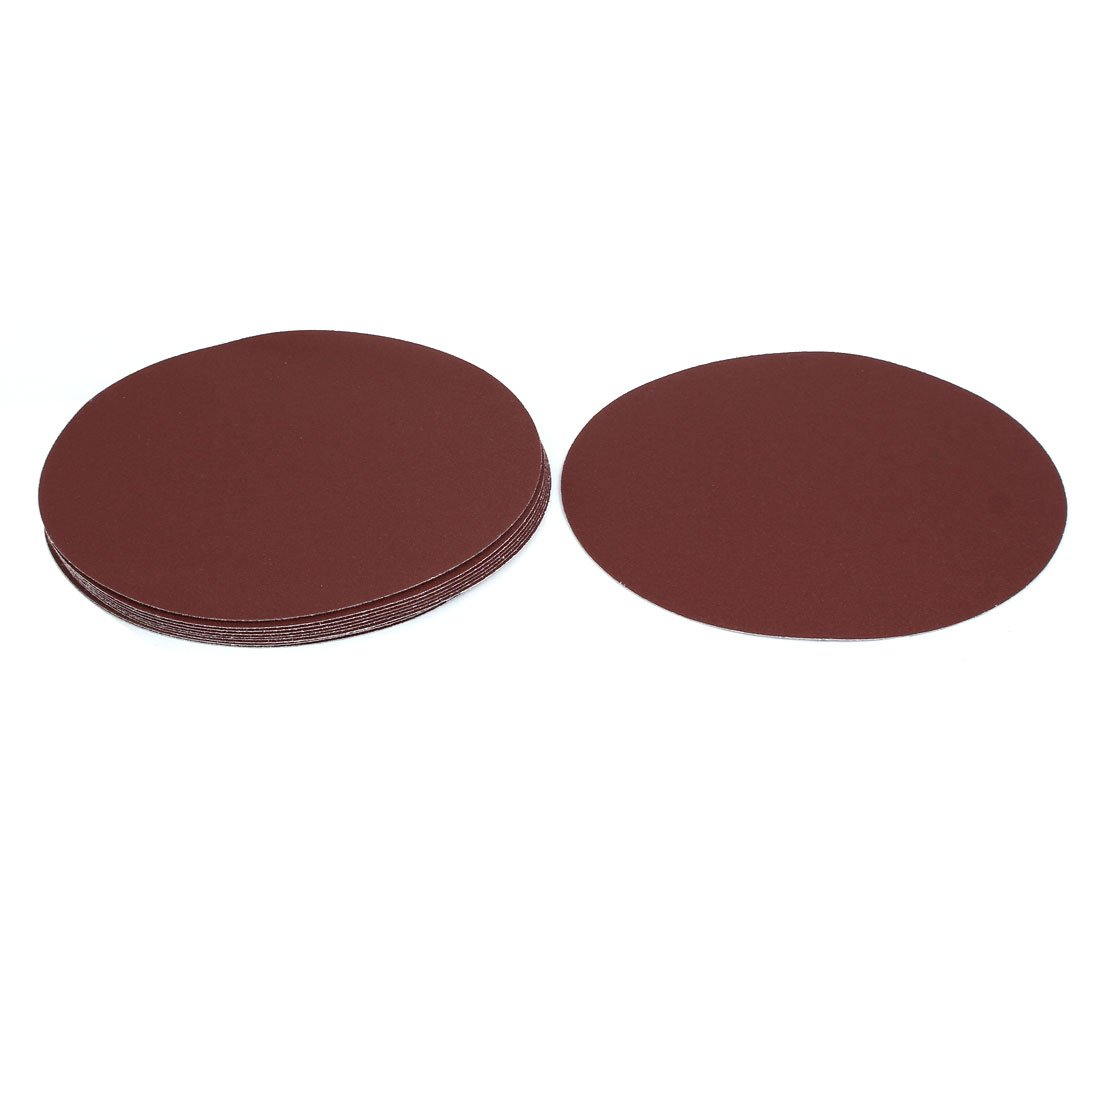 uxcell 9-inch Dia 120 Grits Self-stick Sanding Disc Flocking Sandpaper Polishing Tool 10pcs